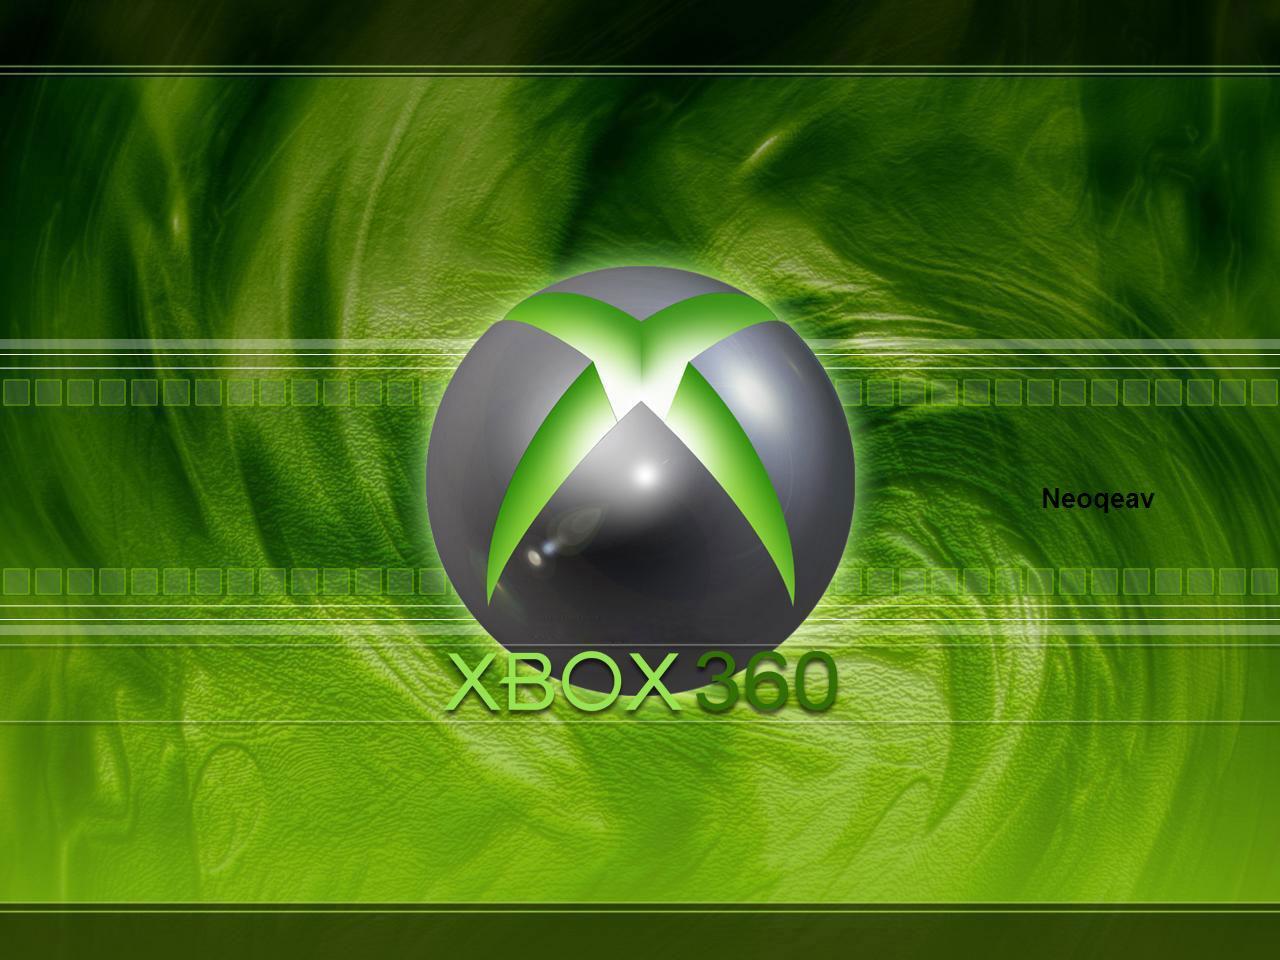 Xbox emulator for pc cxbx c xeon setor